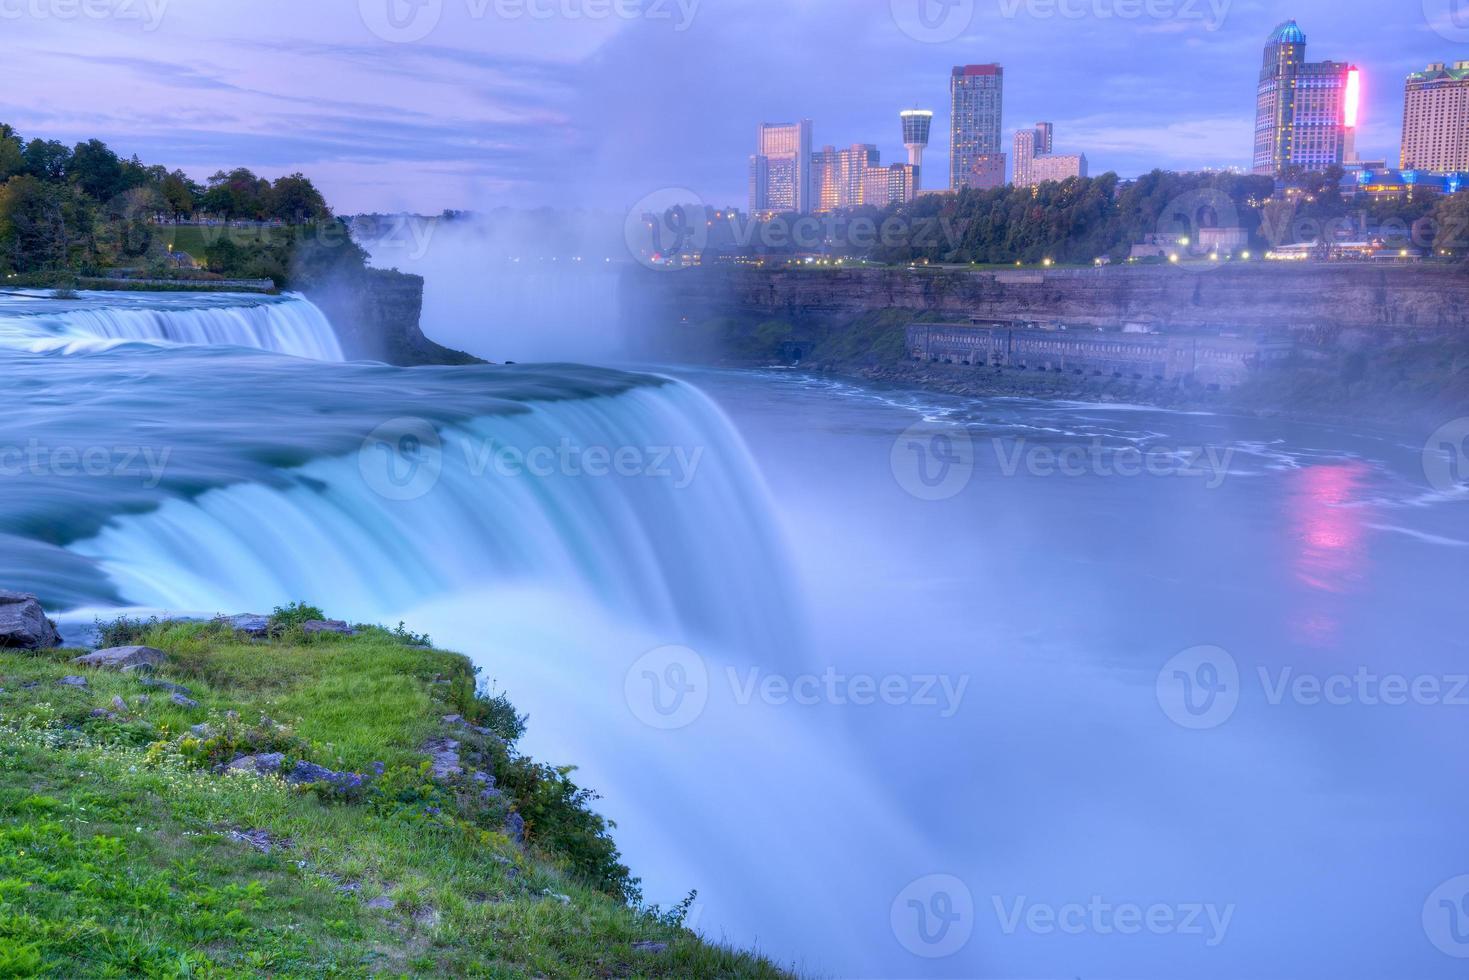 Niagara Falls, Amerikaanse zijde bij zonsopgang. foto